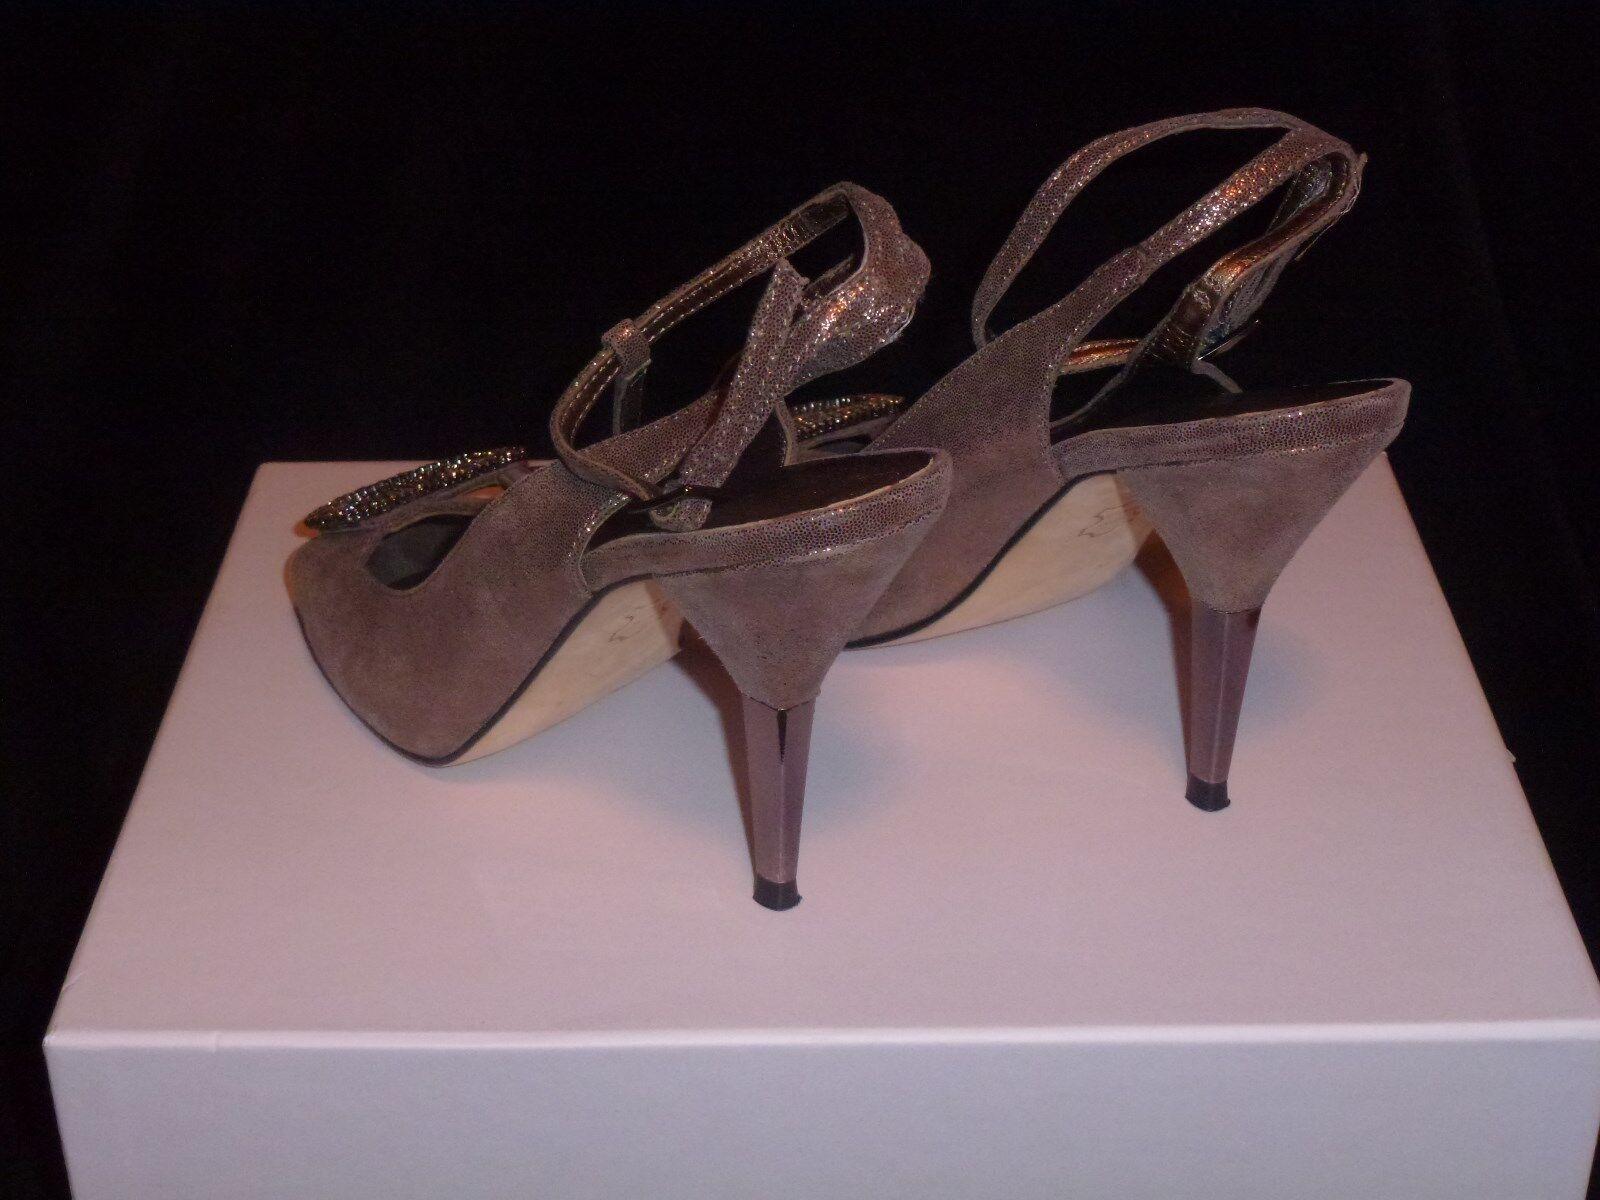 Pelle Pelle Pelle Moda damen schuhe Glittery Bronze 8 M High 3 in and Up c518ff